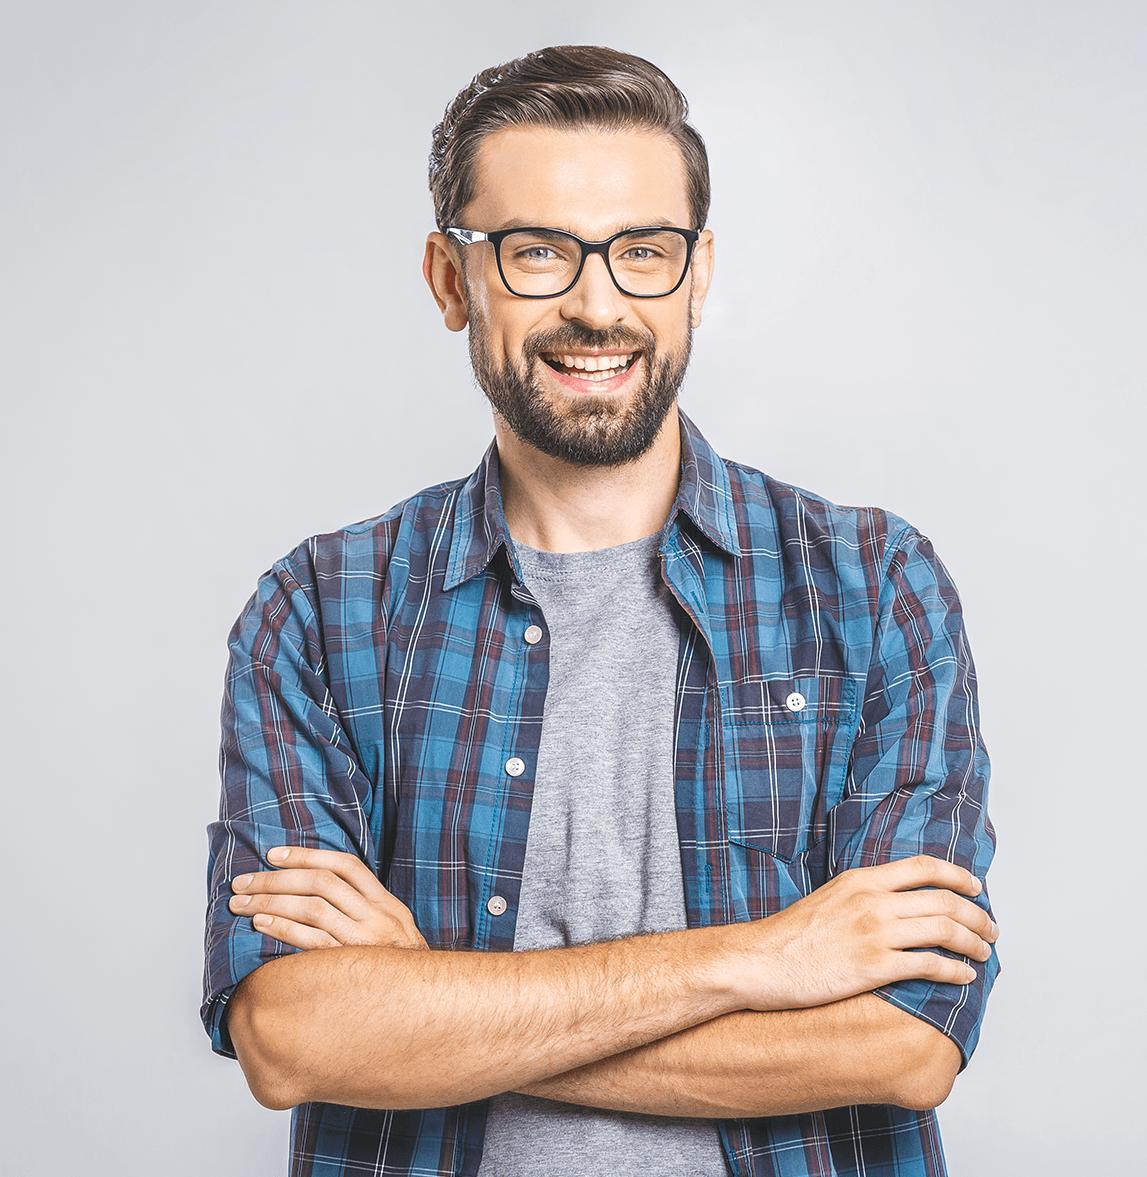 Adult orthodontic treatment patient smiling